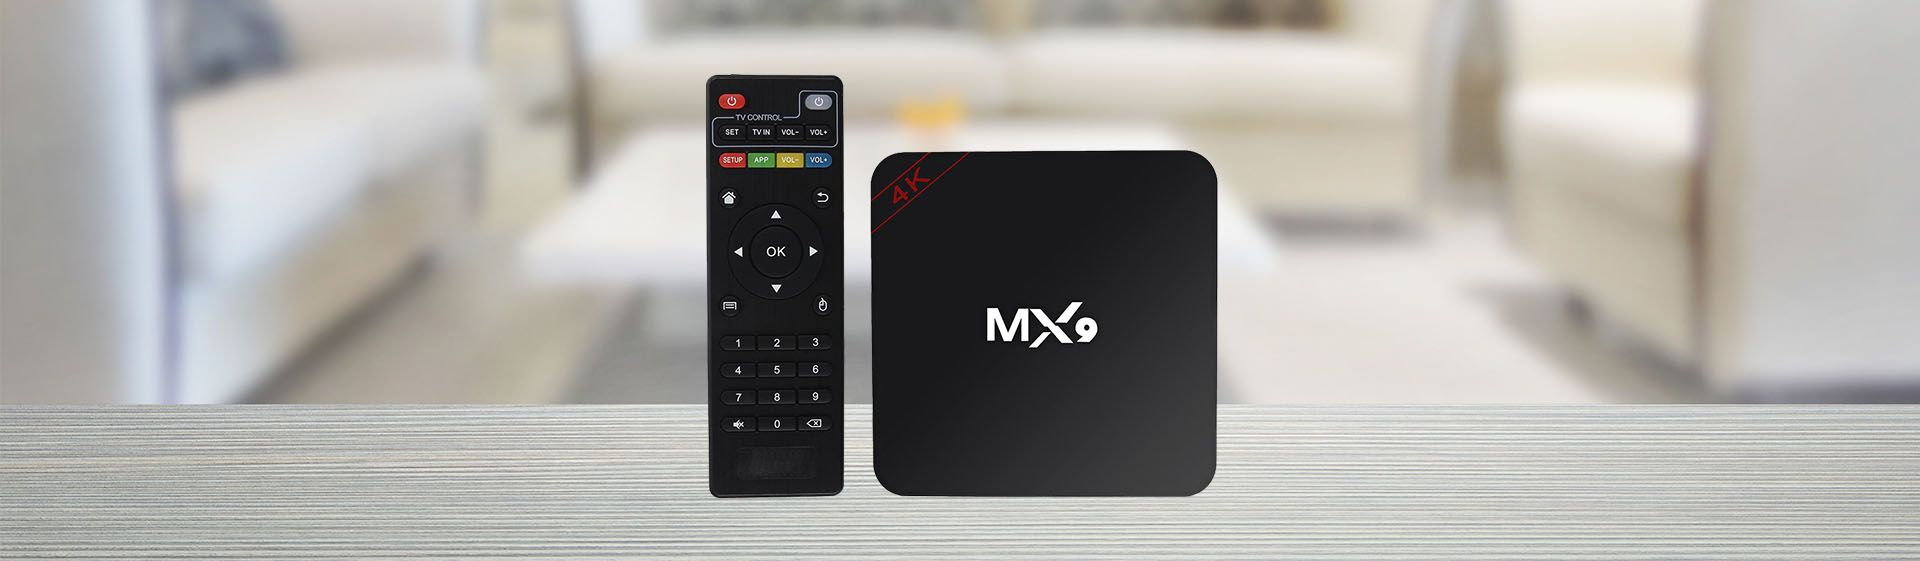 TV box MX9 é boa? Veja a análise da ficha técnica